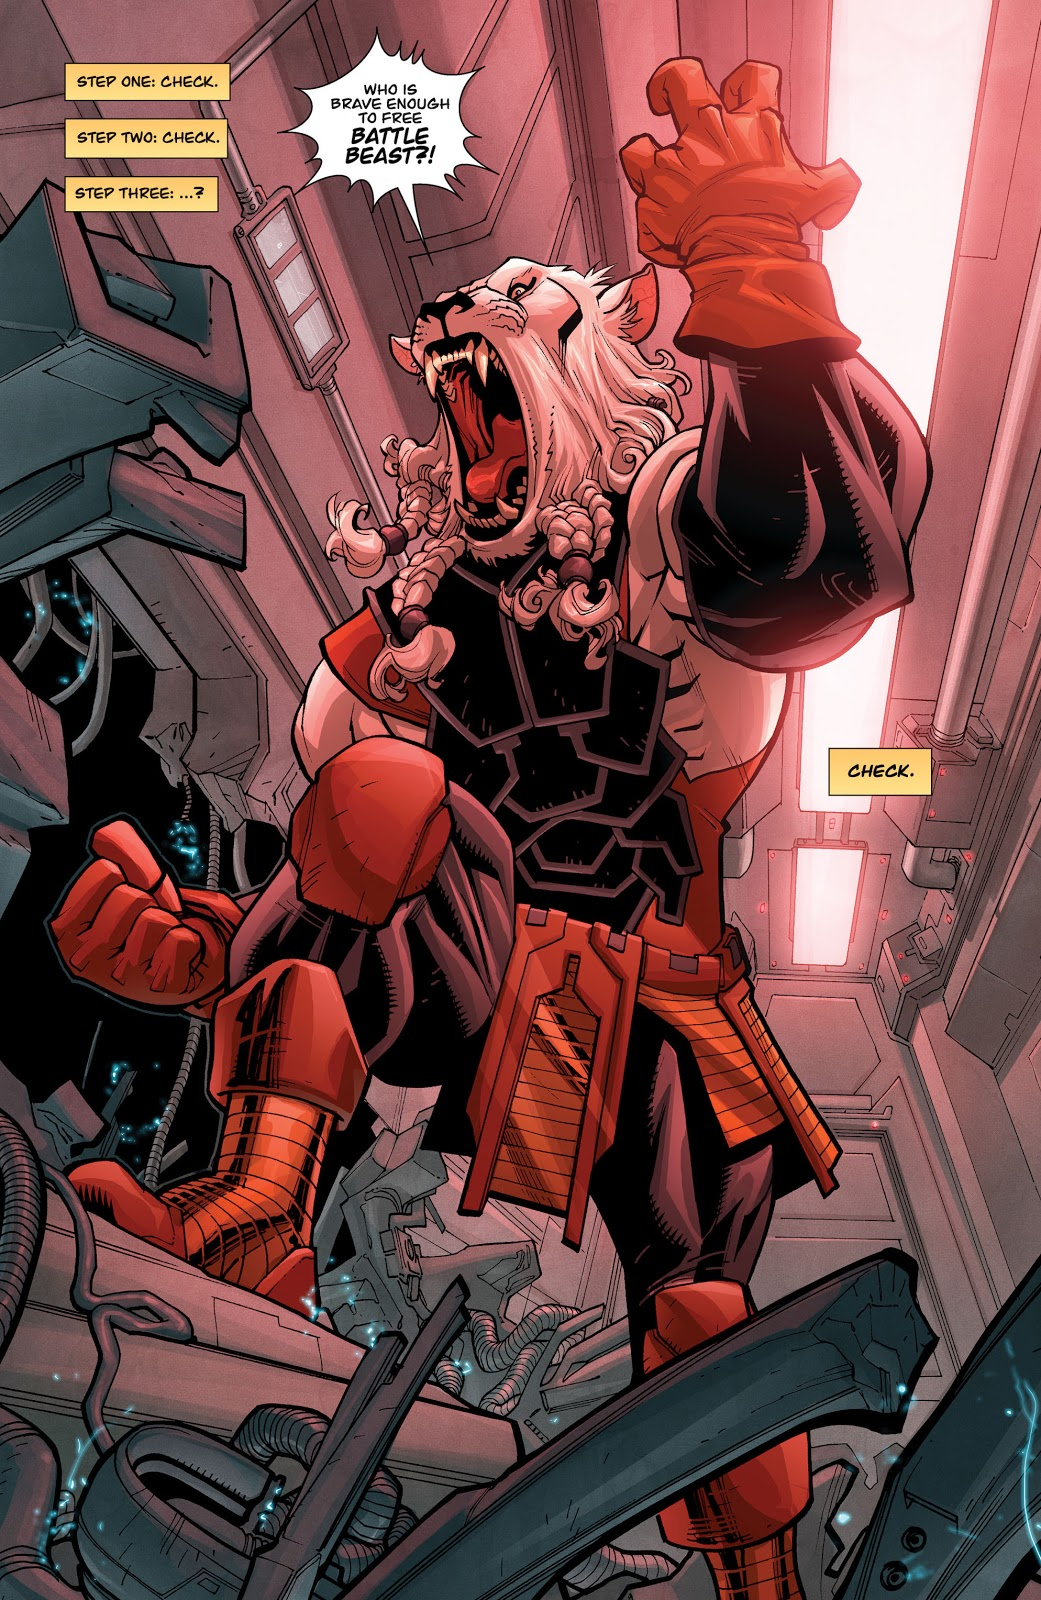 Battle Beast (Invincible #55)